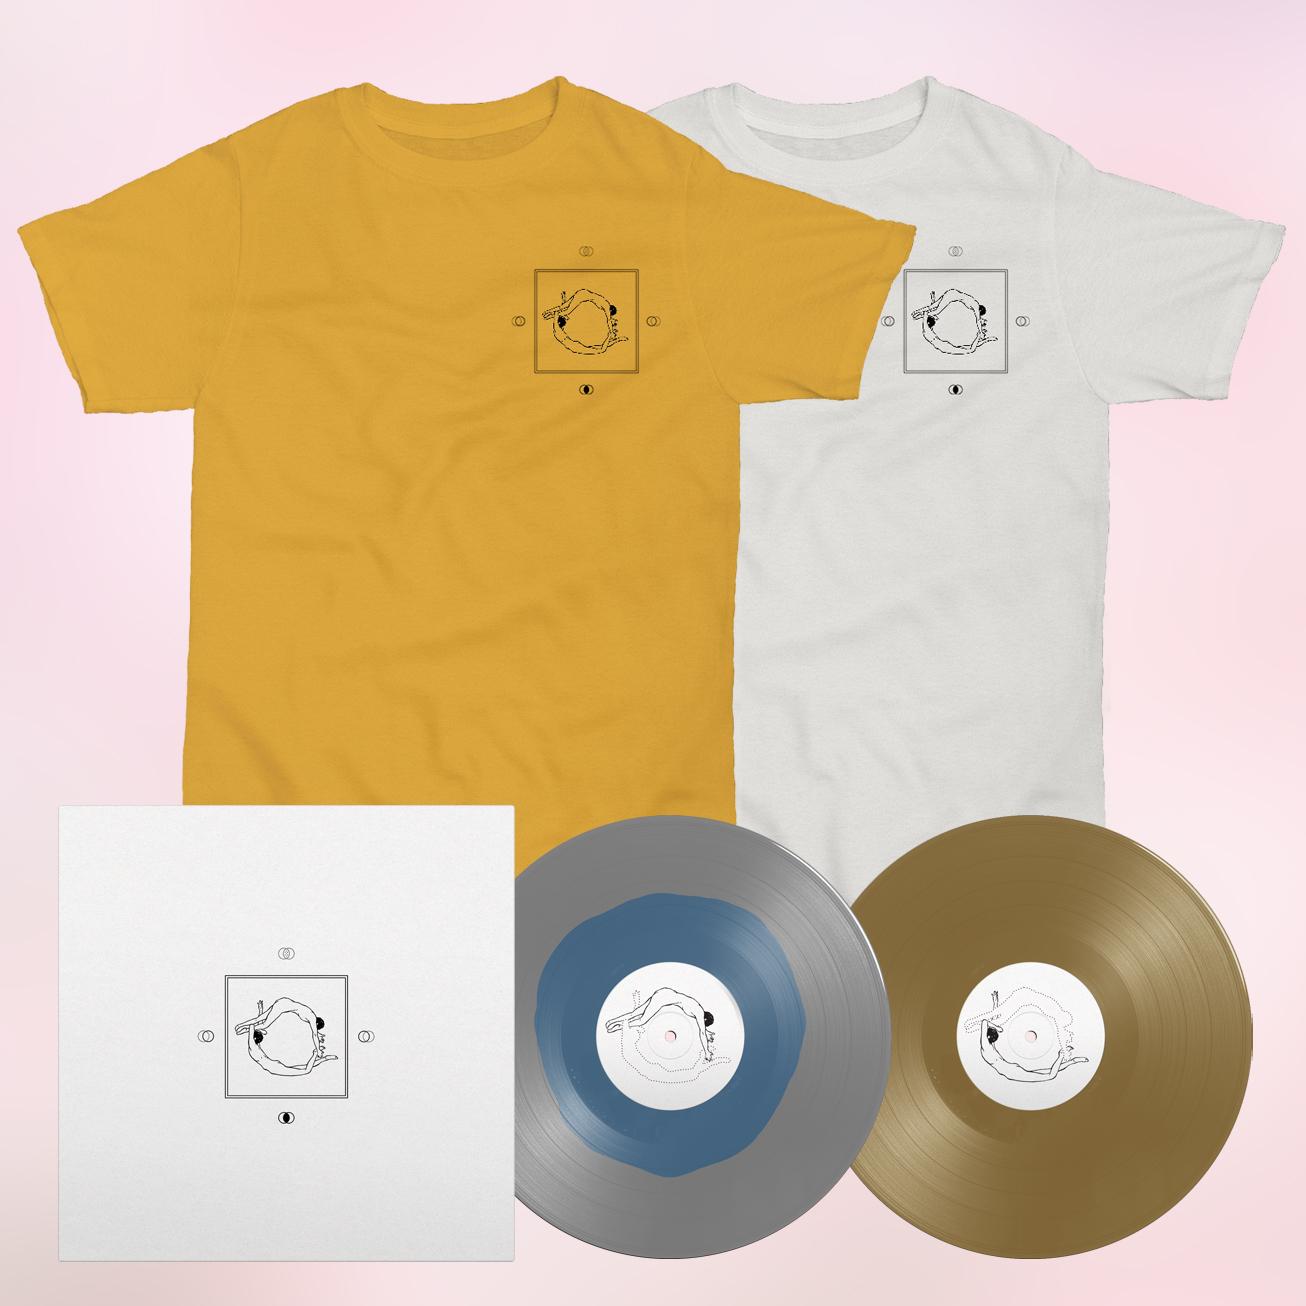 Earth Moves - Vinyl + Shirt Bundle